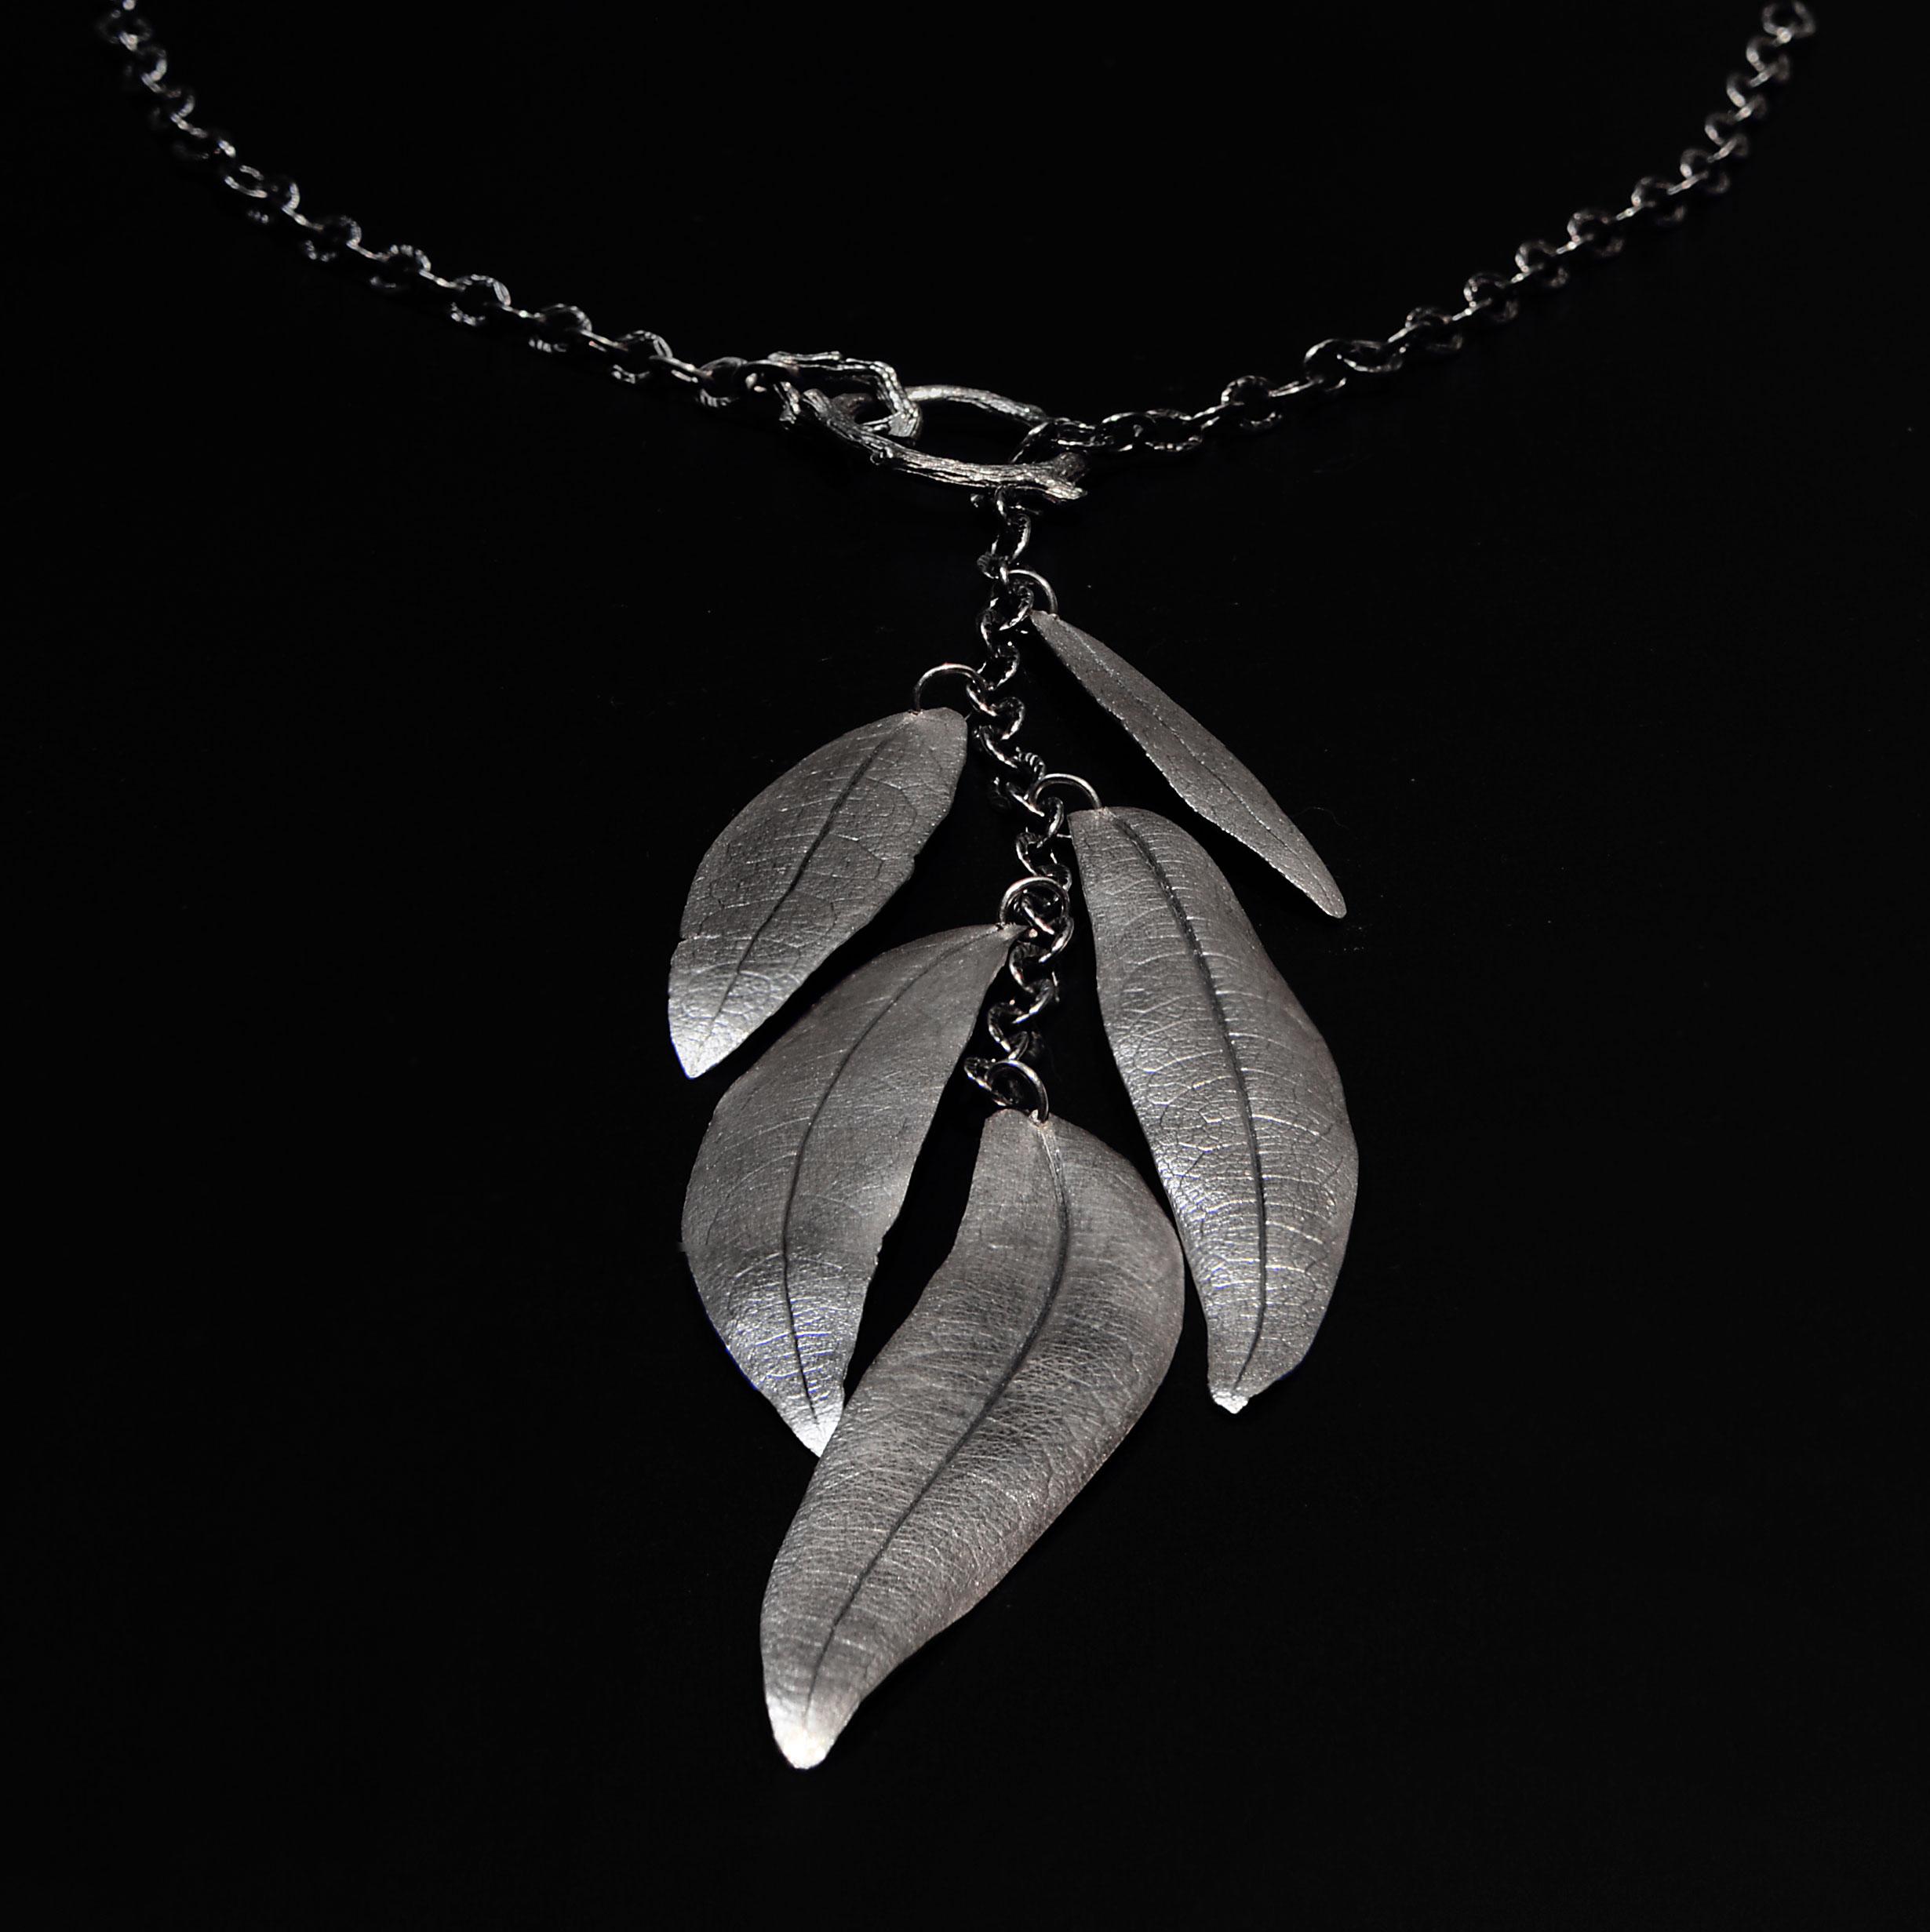 eucalyptus-lariat-necklace-michelle-hoting-web.jpg